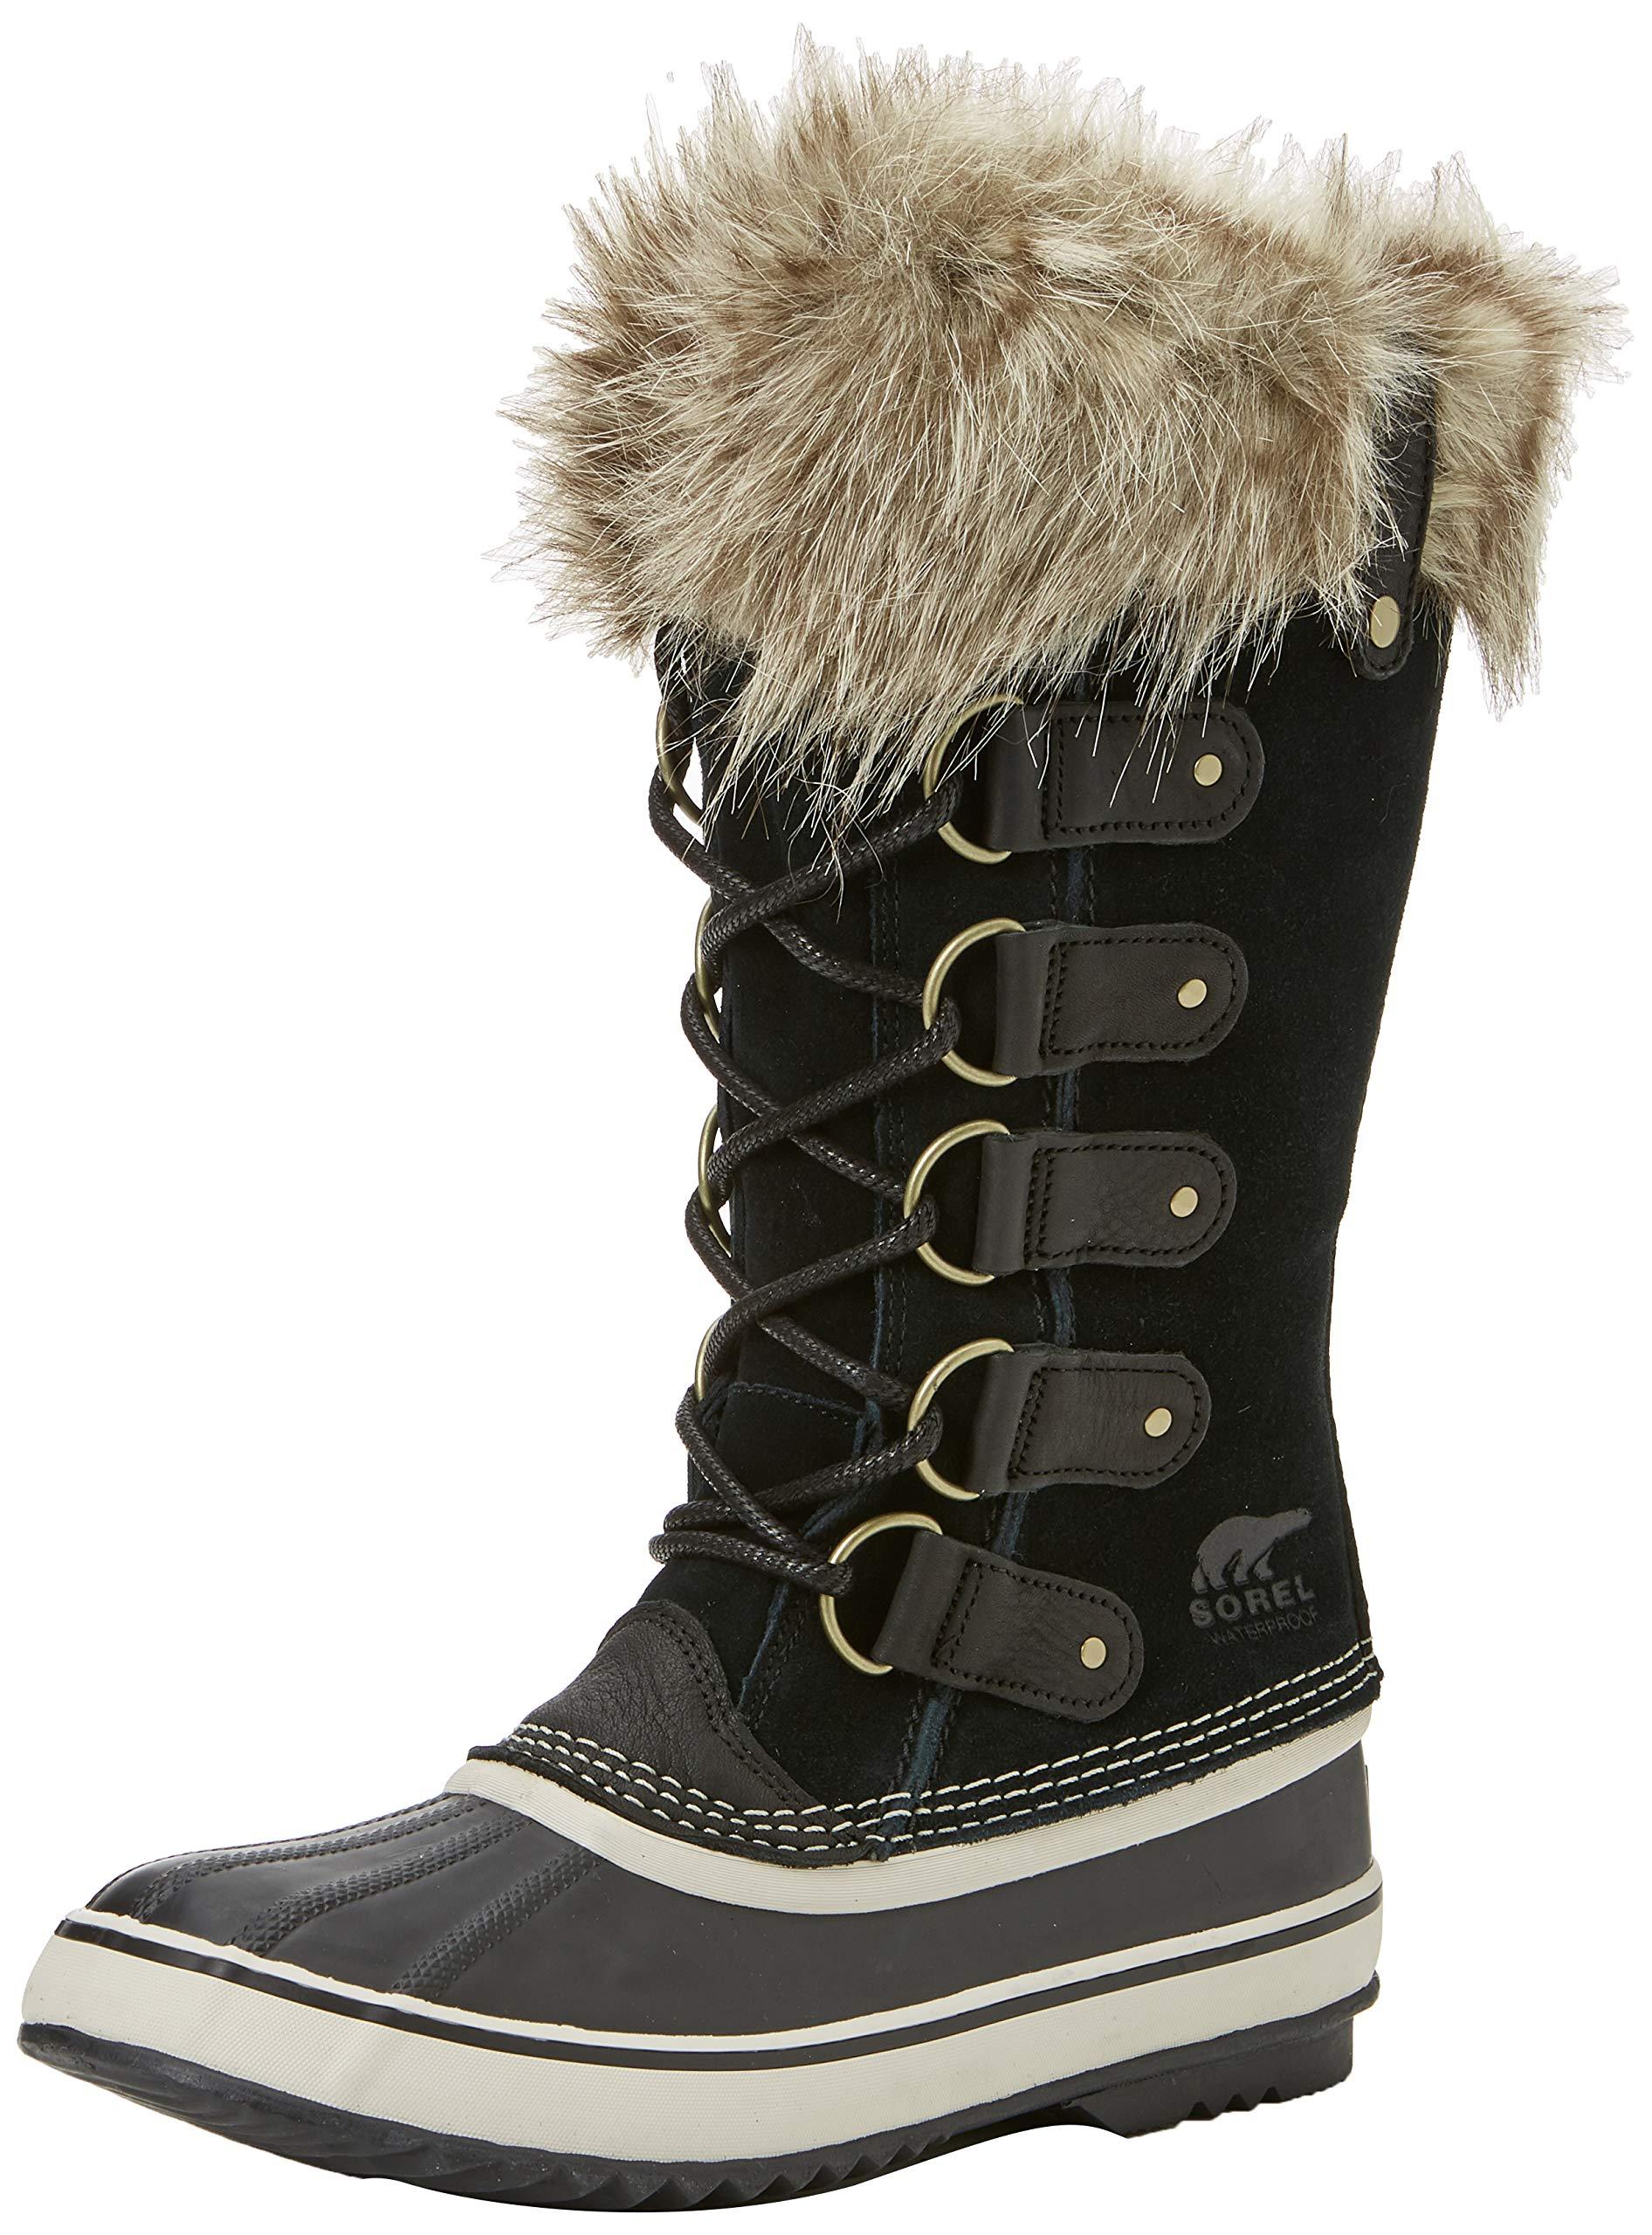 Sorel Women's Joan of Arctic Boot, Black, Stone, 8 M US by Sorel